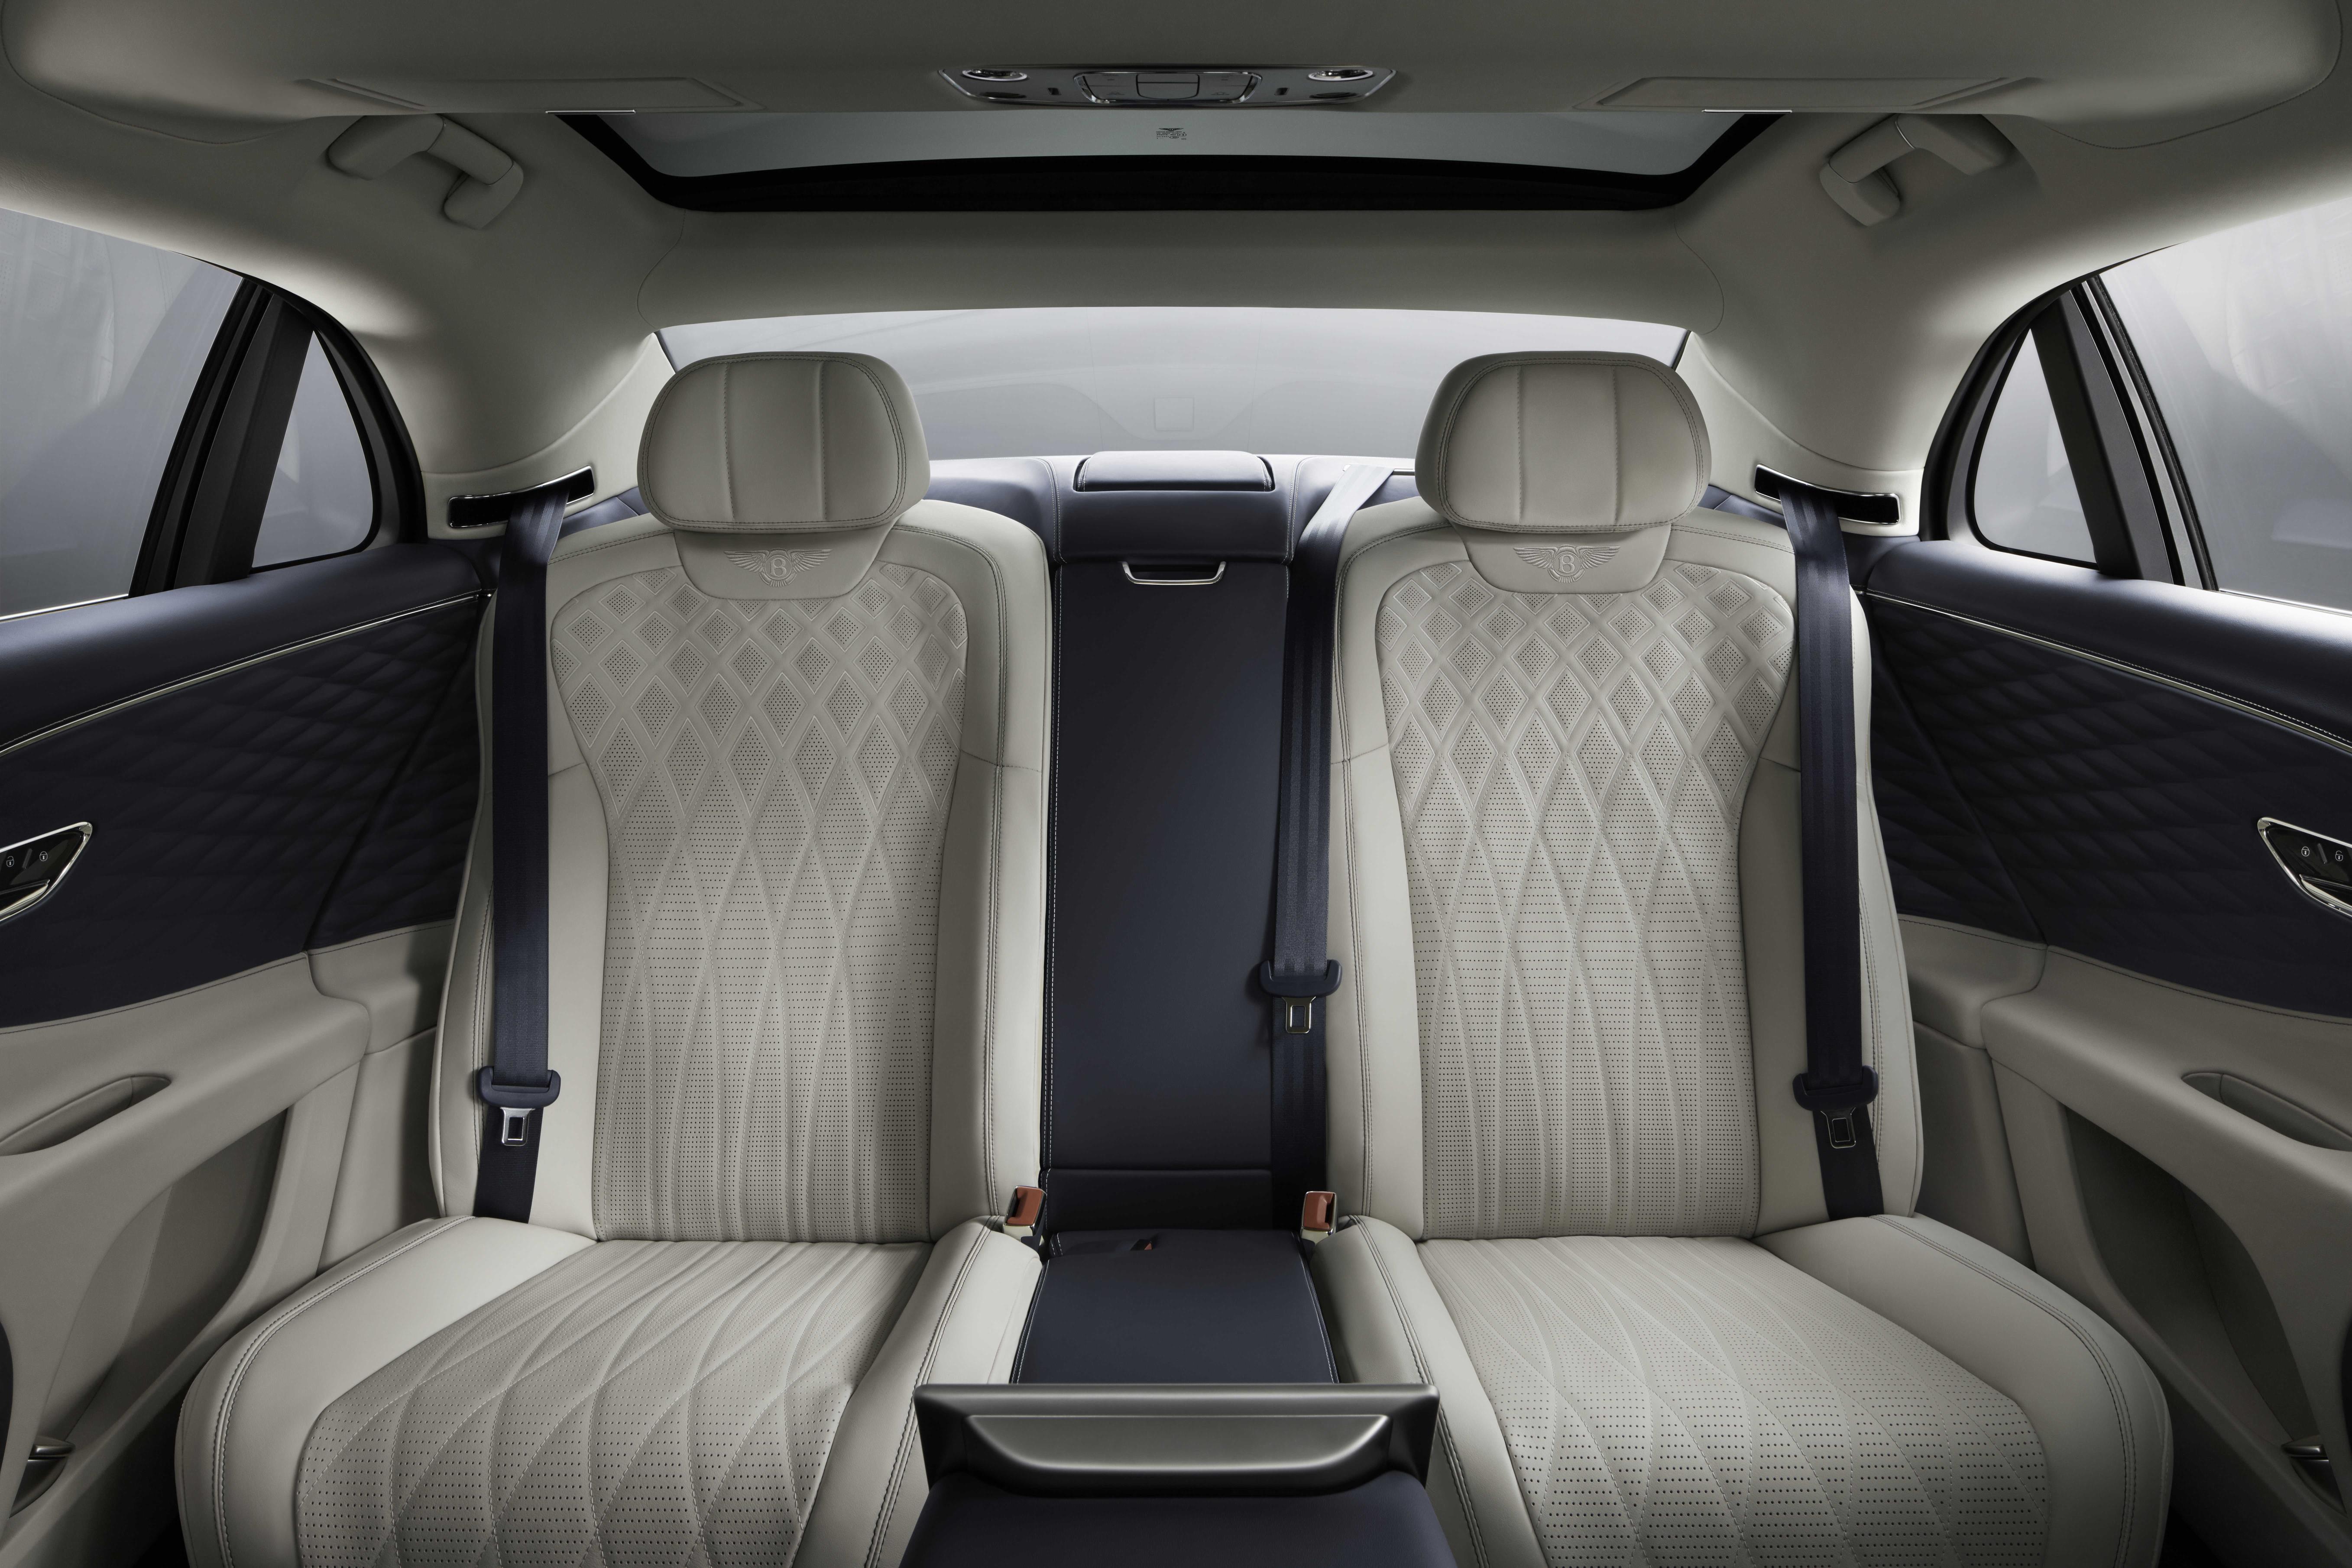 2020 Bentley Flying Spur Rear Seats